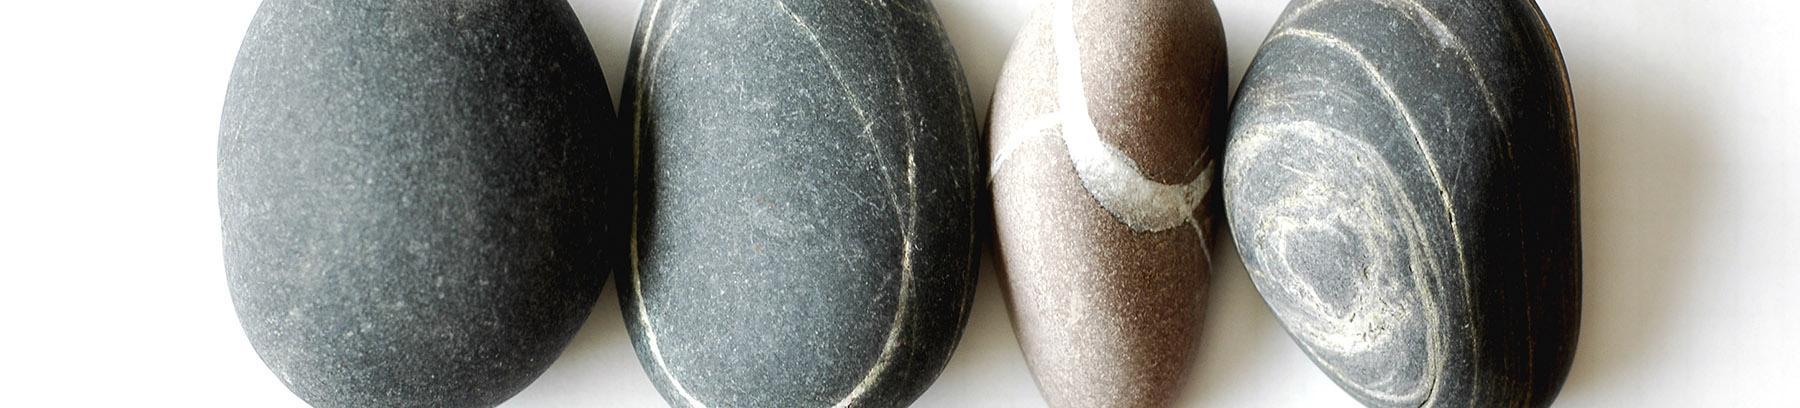 Image of rocks.